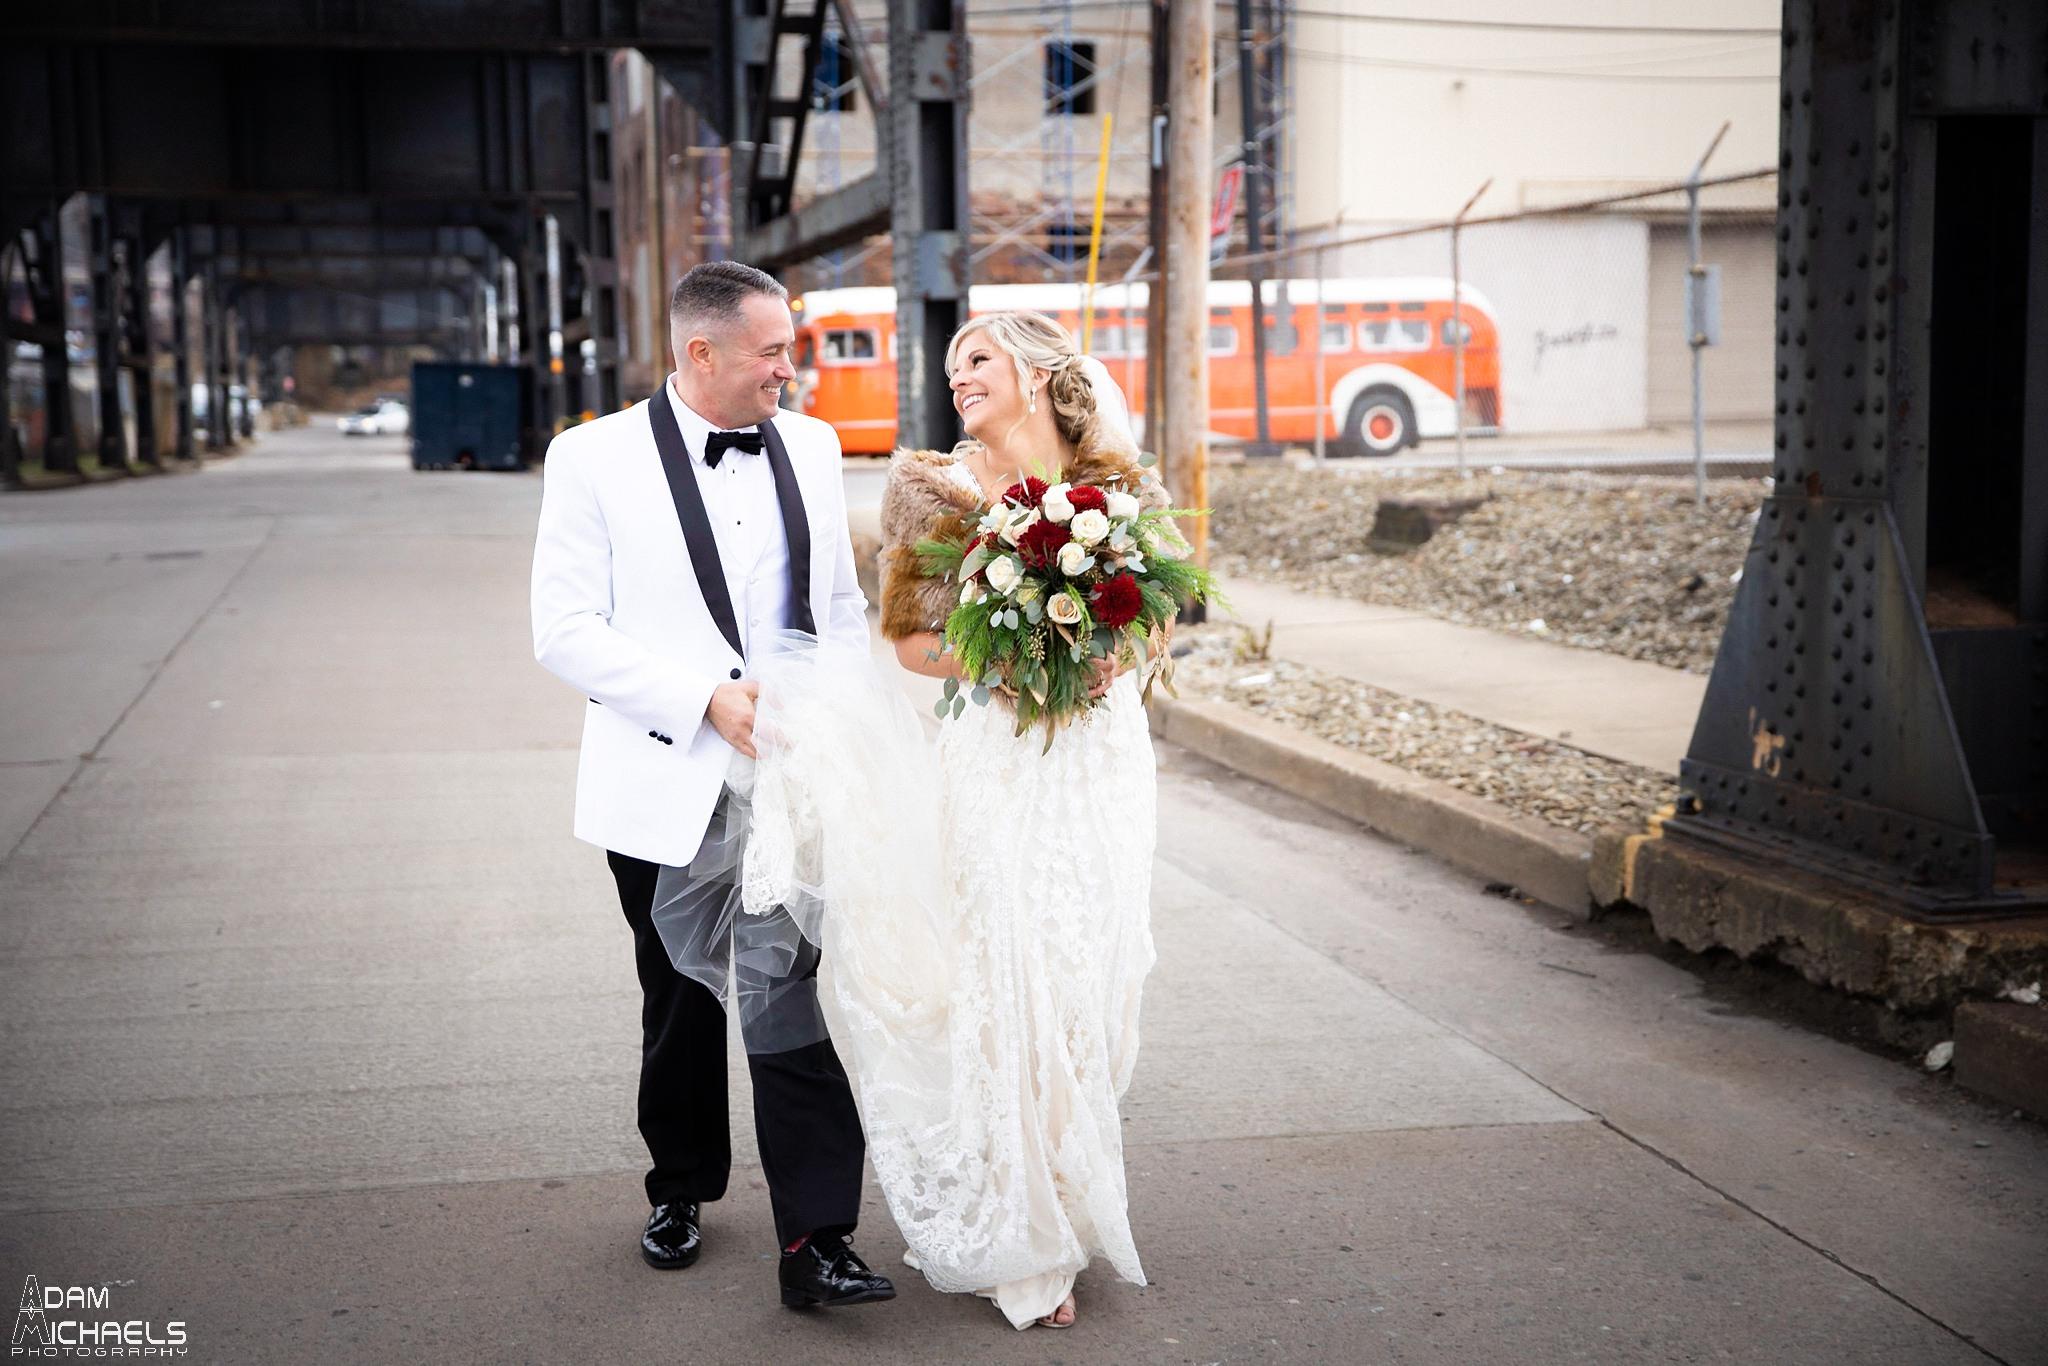 Pittsburgh Strip District 33rd Street Wedding Pictures_2902.jpg